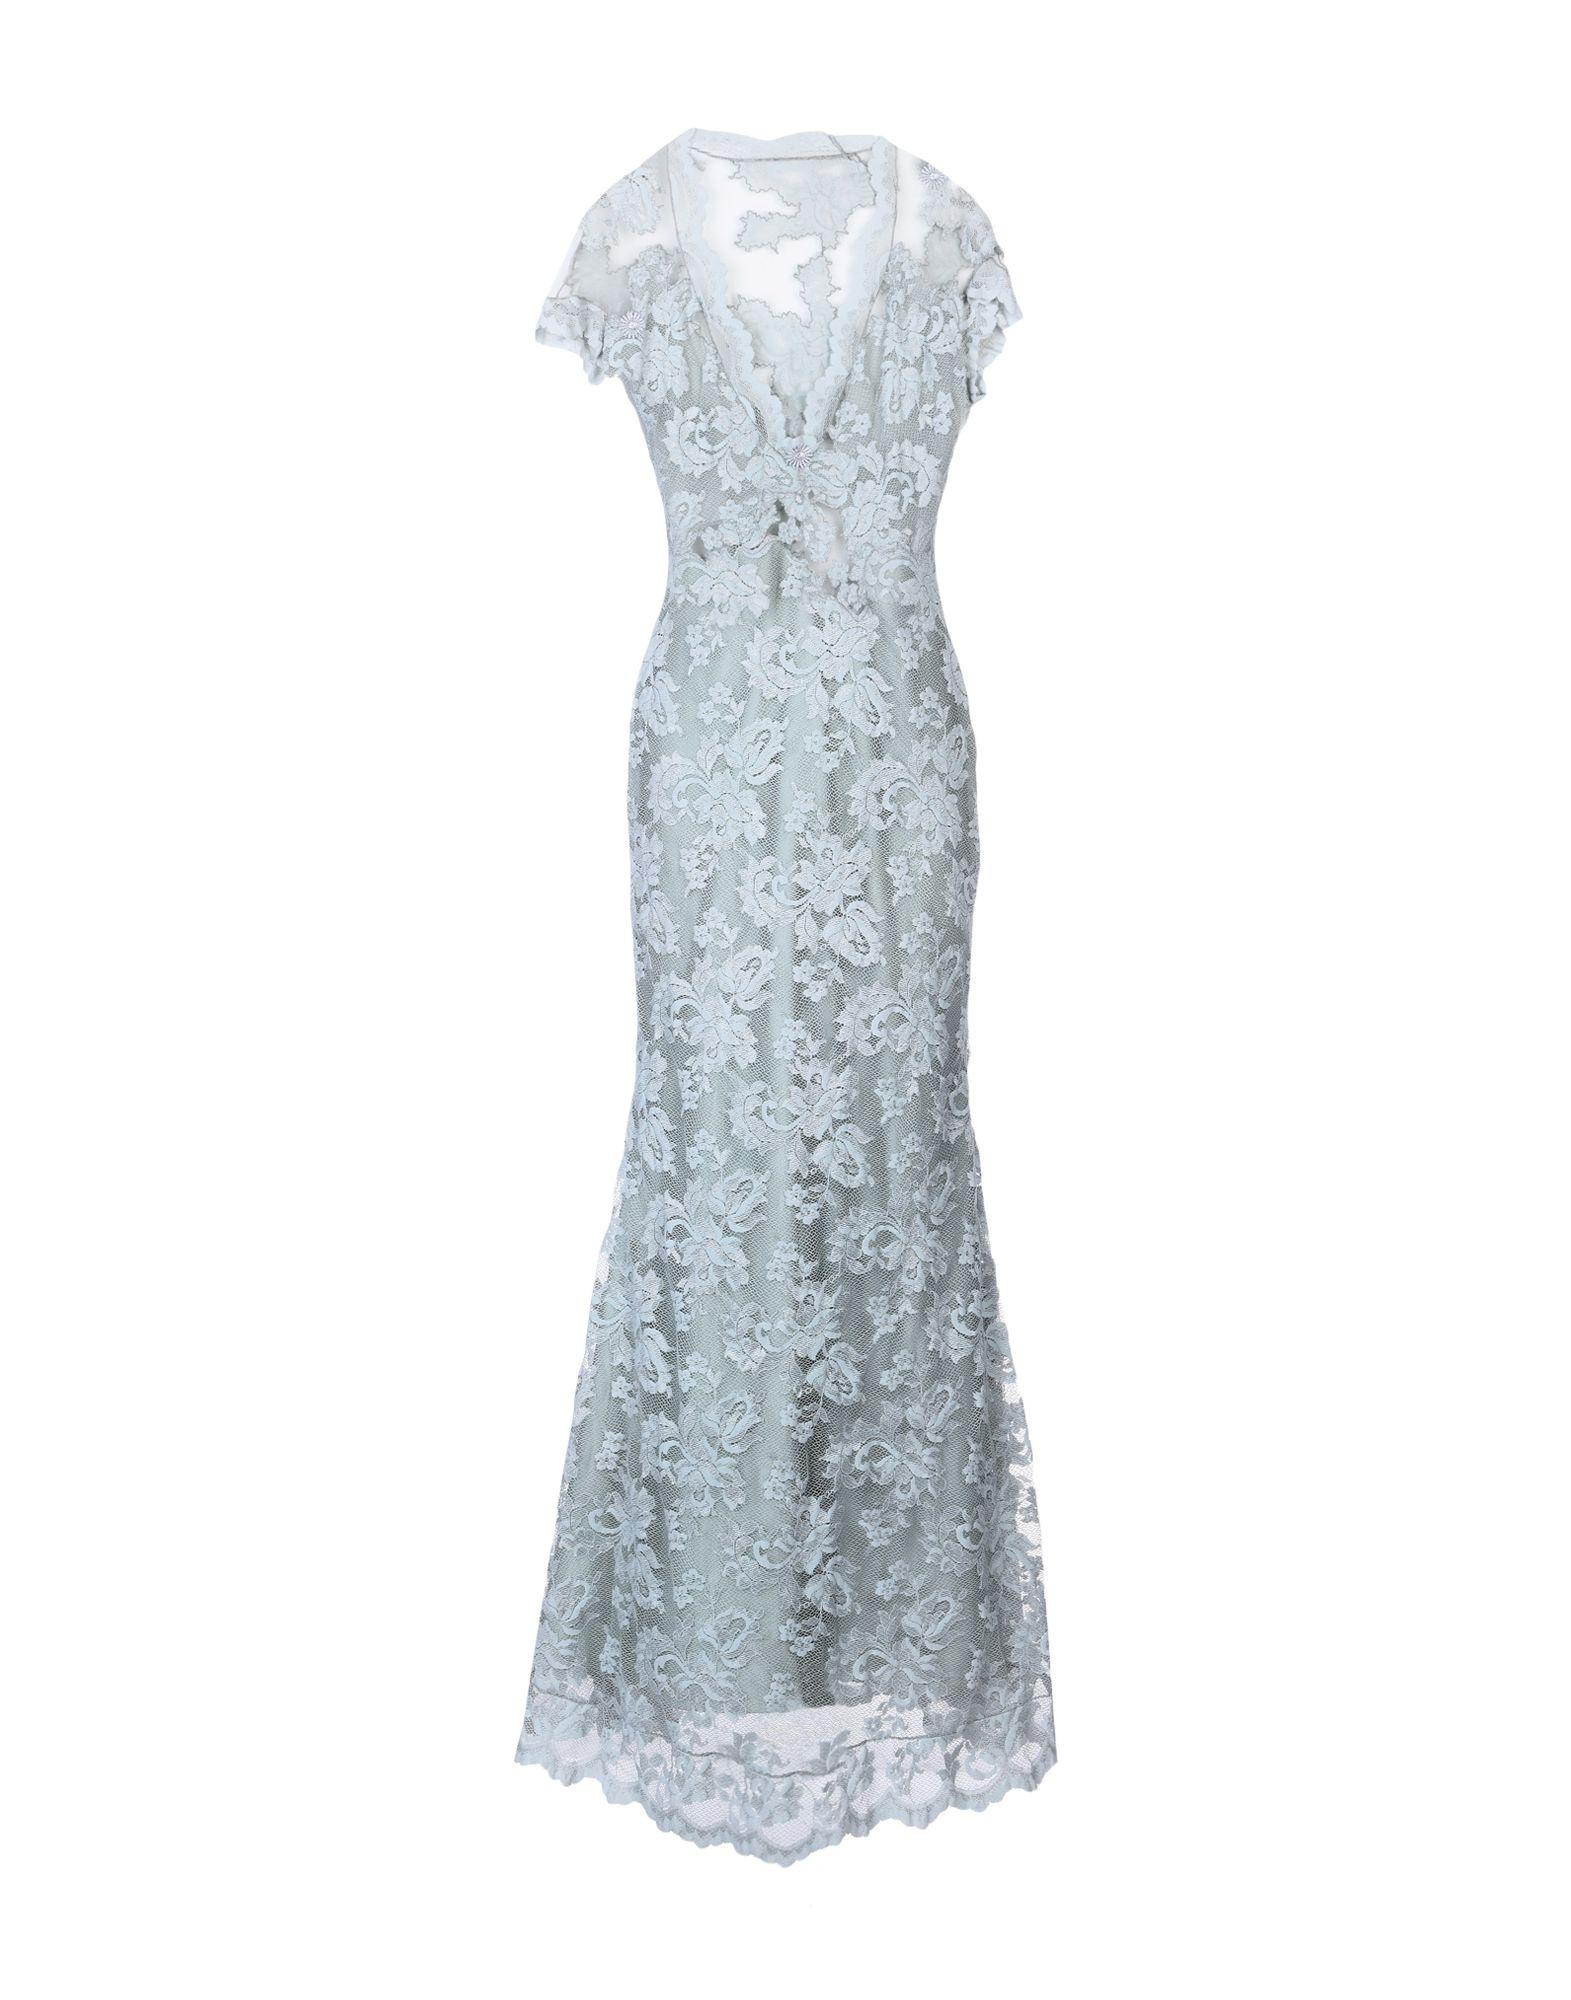 DRESSES - Long dresses Balensi llR5bHY2k